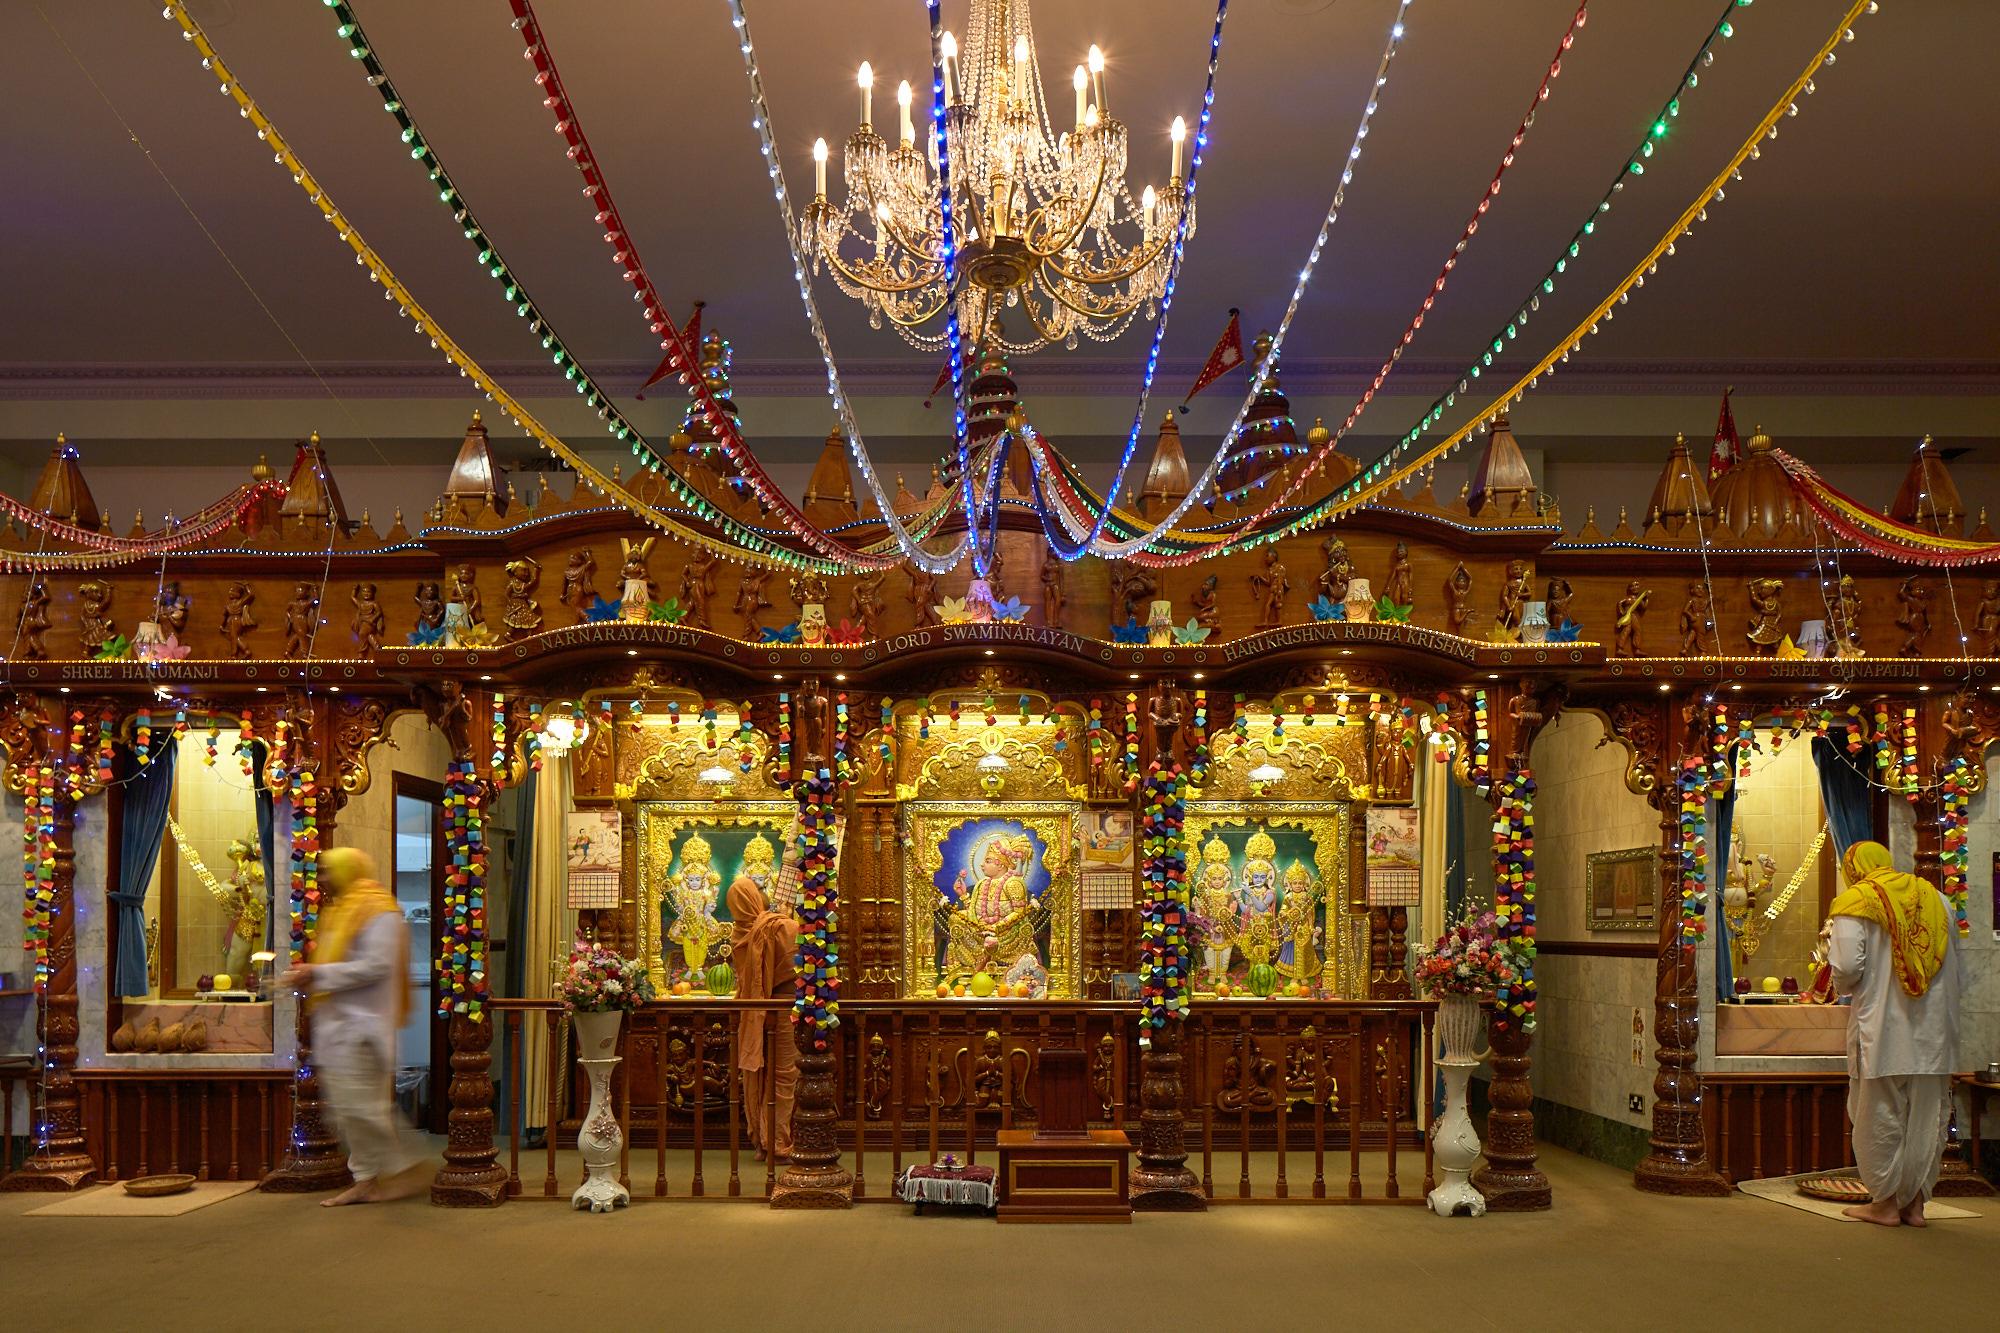 Shree Swaminaryan Temple Willesden – men's section